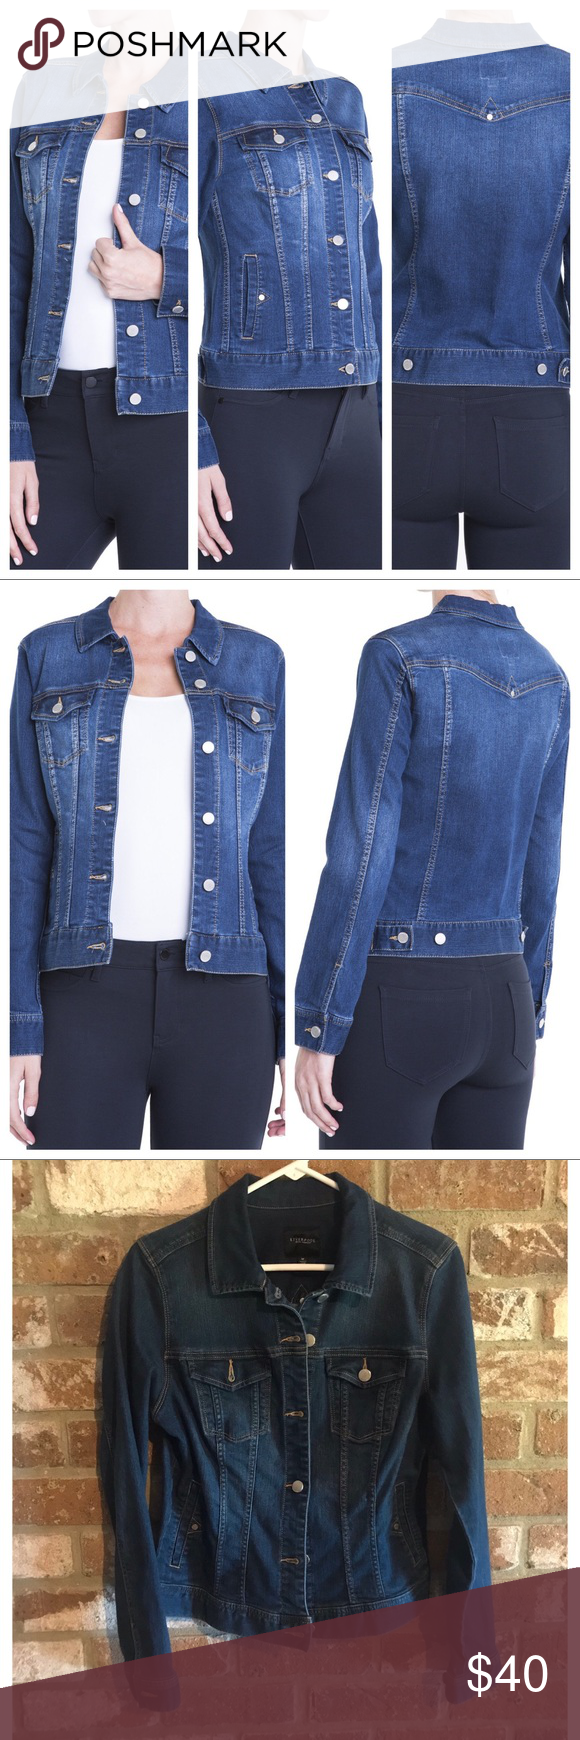 Liverpool Jeans Dark Americana Jean Jacket Med Liverpool Jeans Clothes Design Jackets [ 1740 x 580 Pixel ]